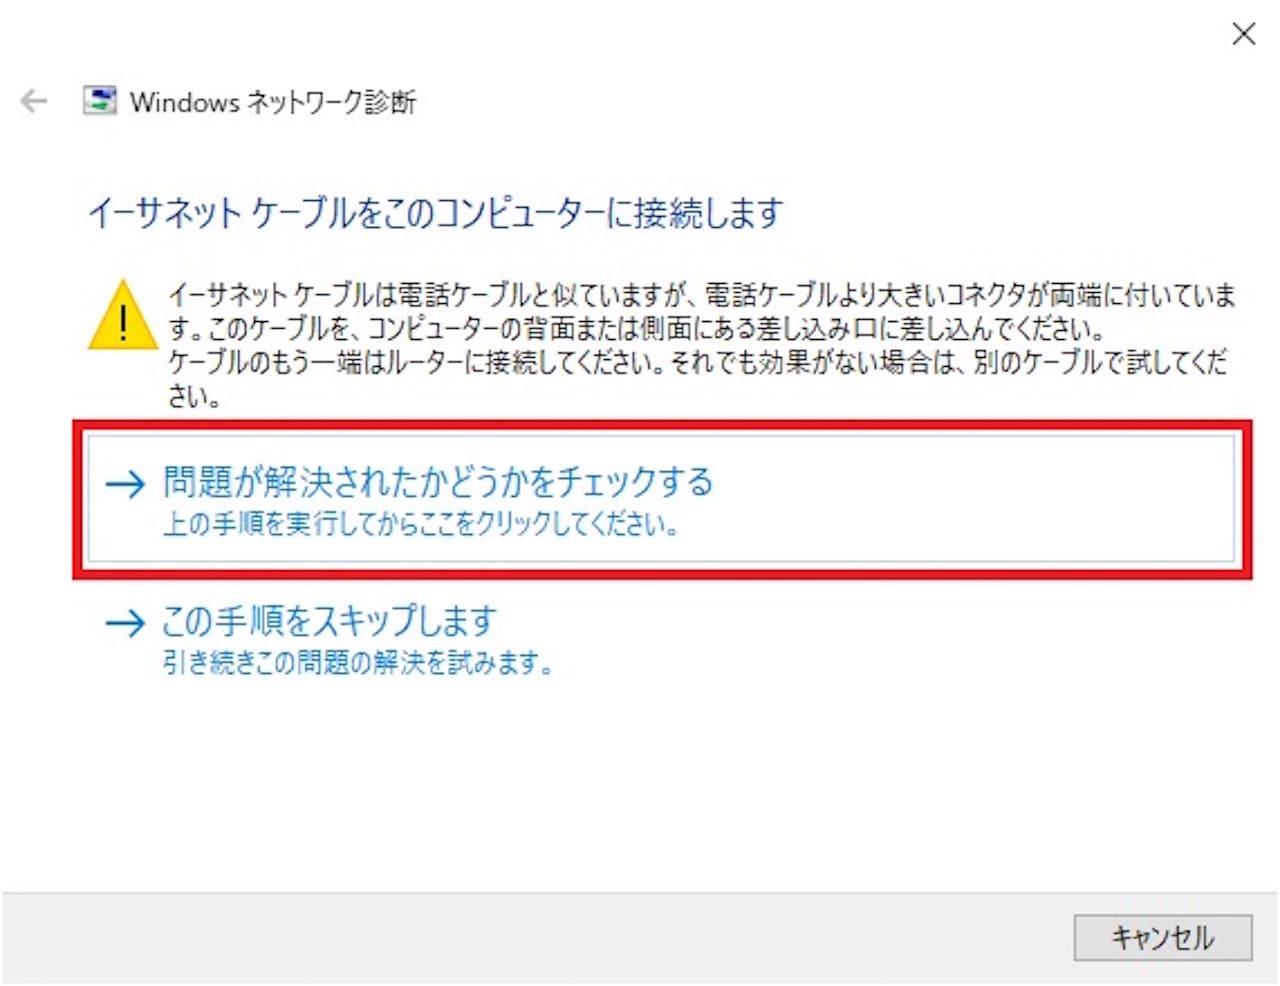 Windows10でトラブルシューティングを実行する方法⑤